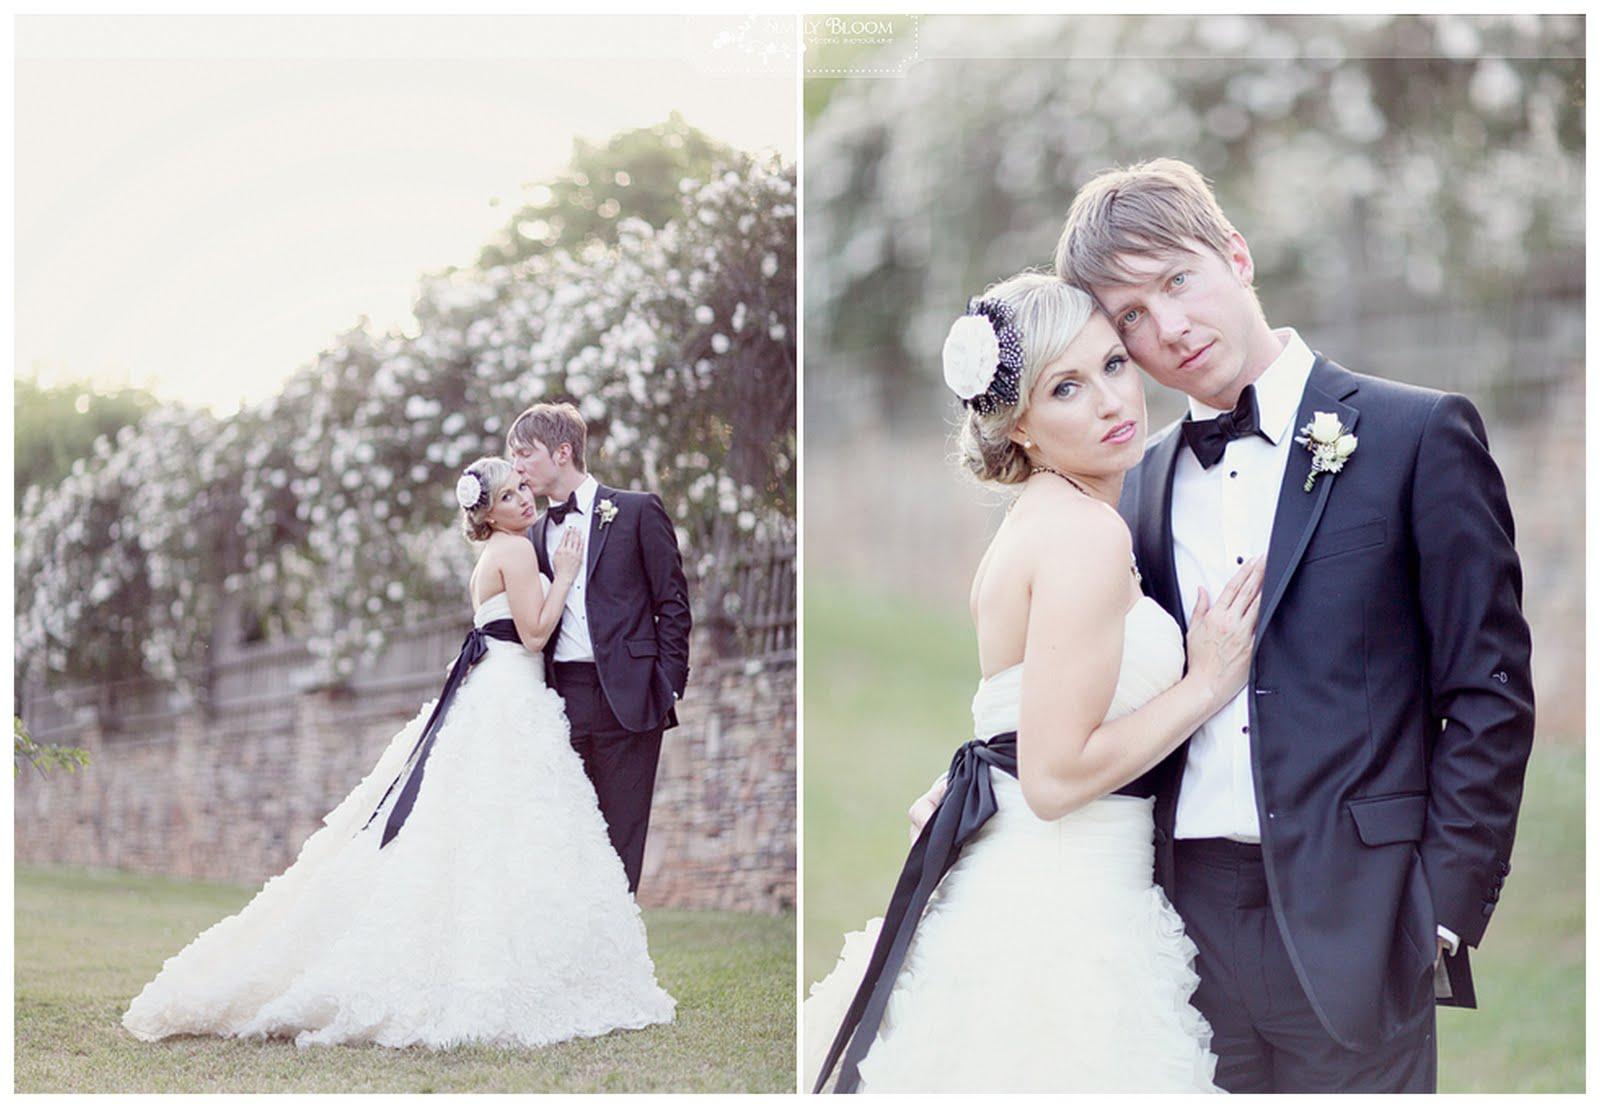 Bude ohne betreuung wedding